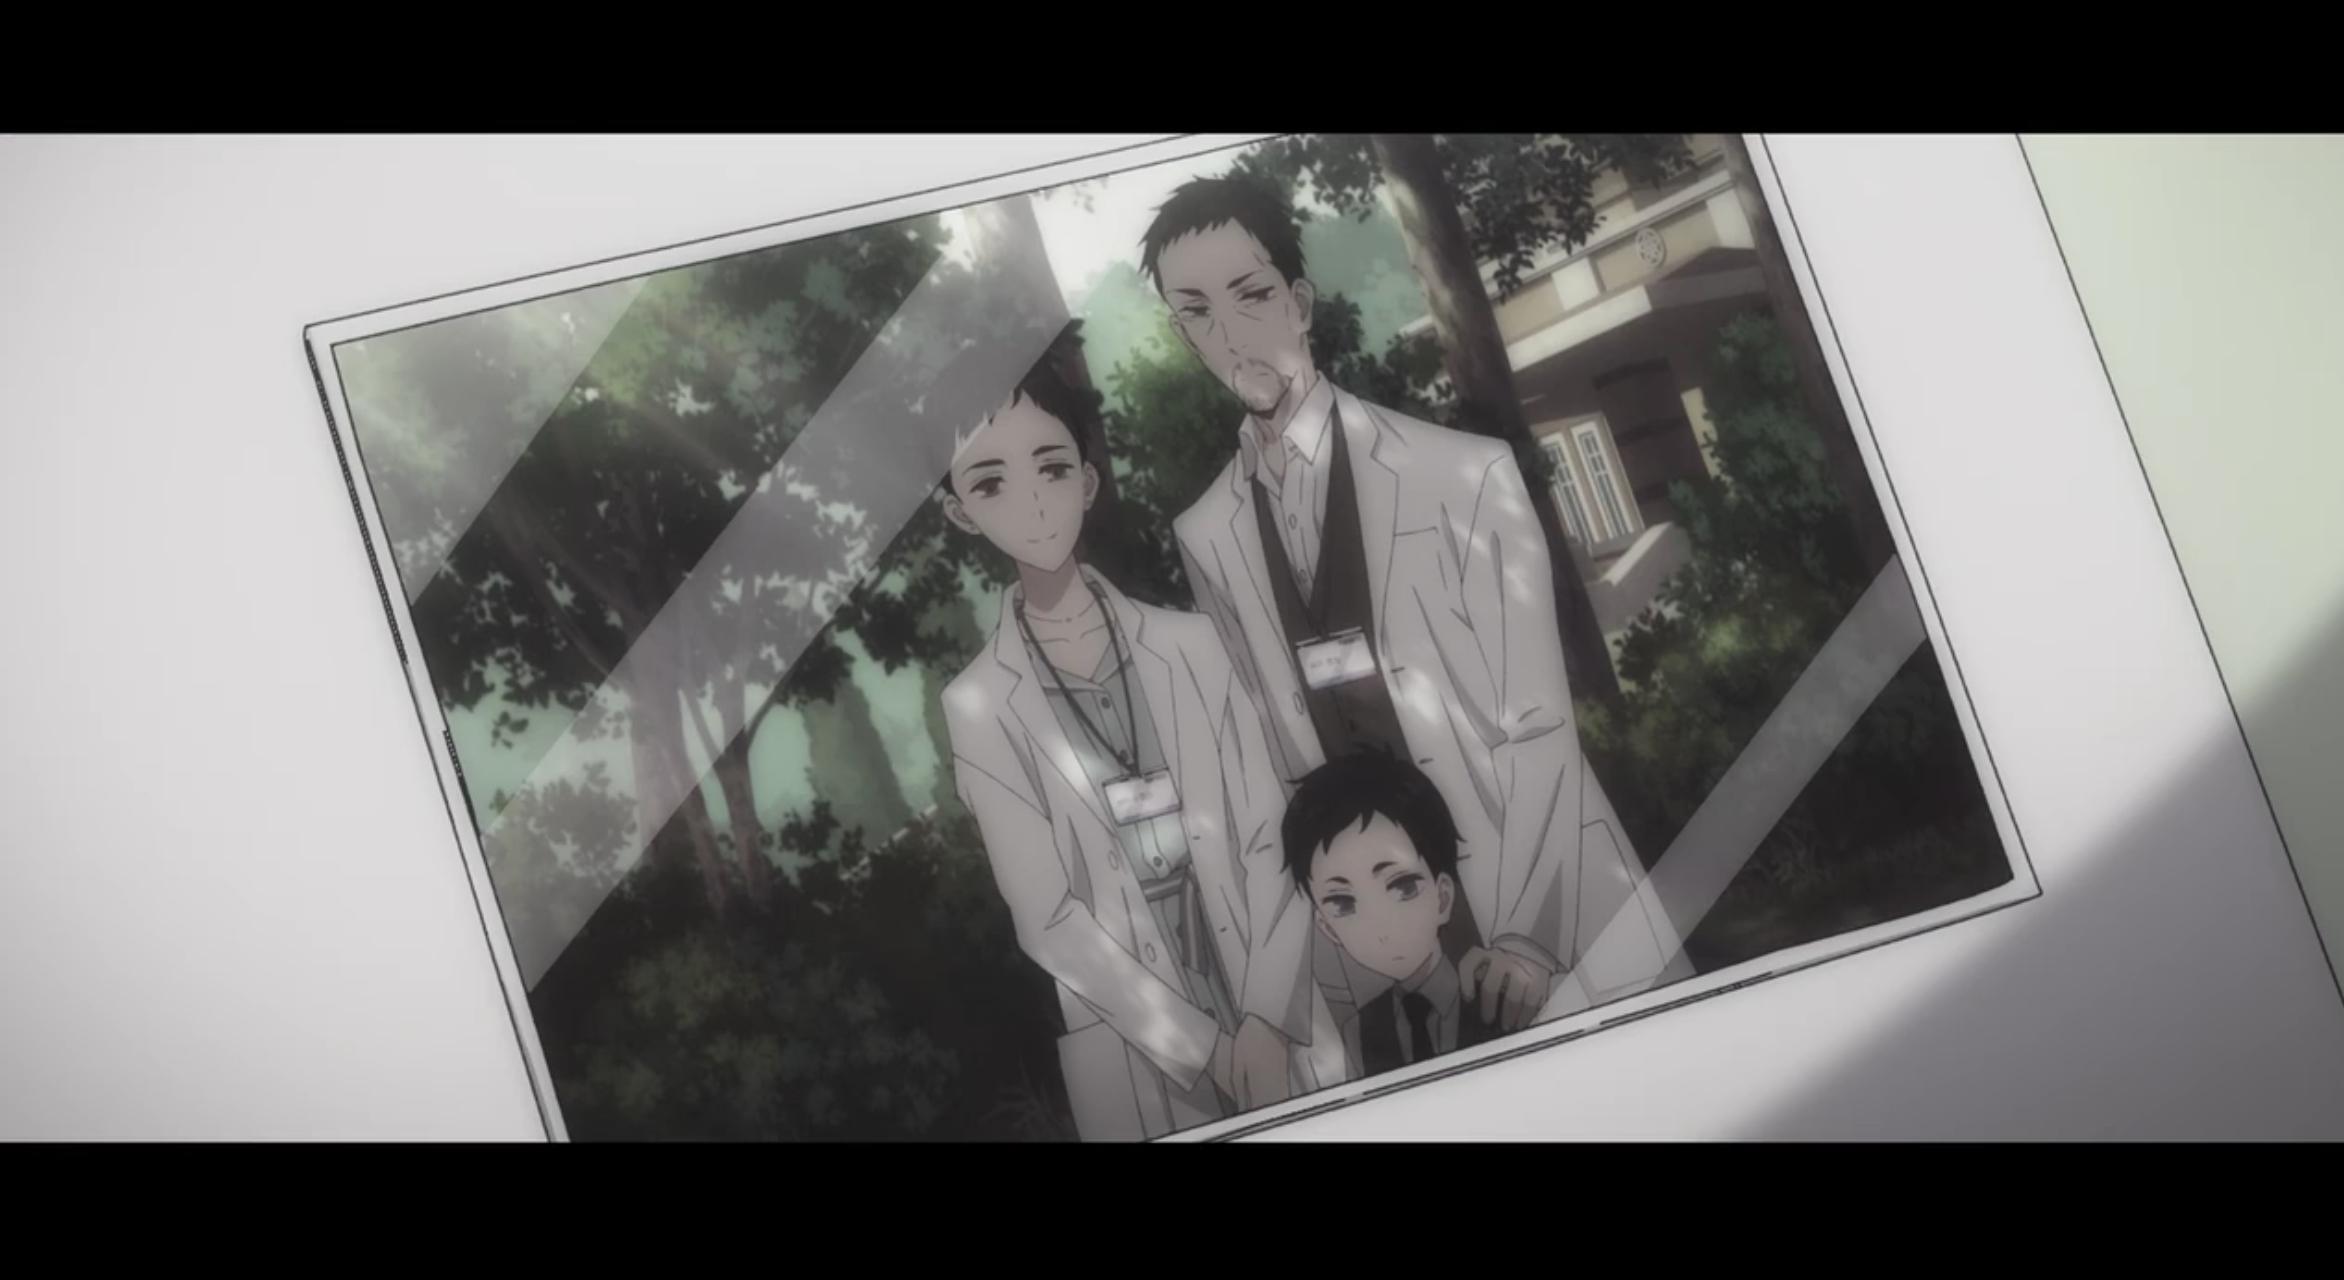 TVアニメ『富豪刑事』7話感想 大助の母・小百合が殺された過去の事件に迫る!過去と現在が入り乱れる演出が神